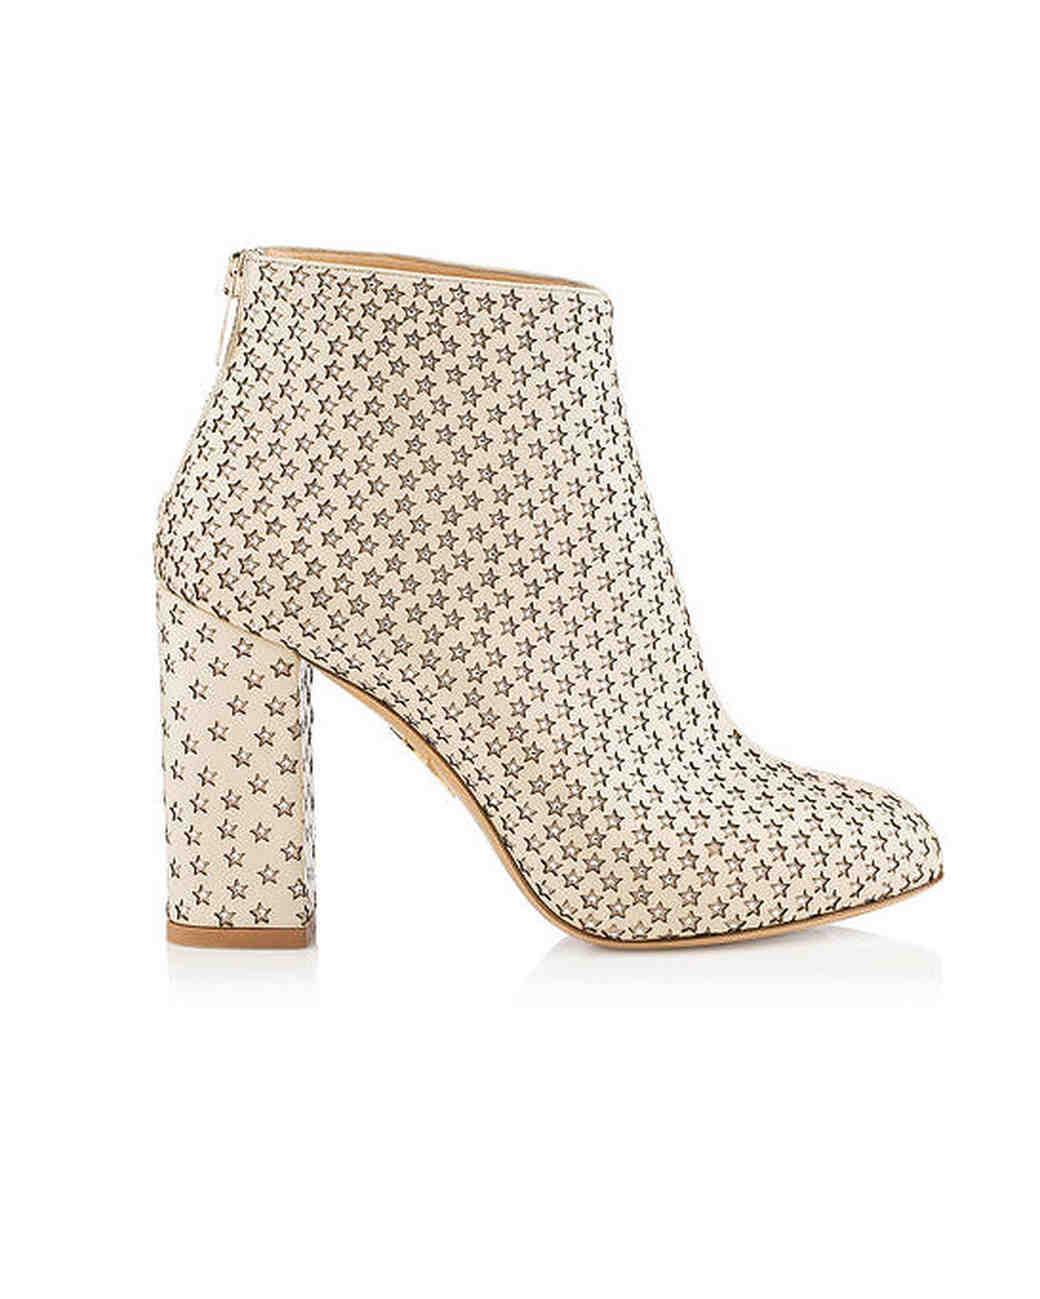 bridal booties charlotte olympia alba star chunky heels